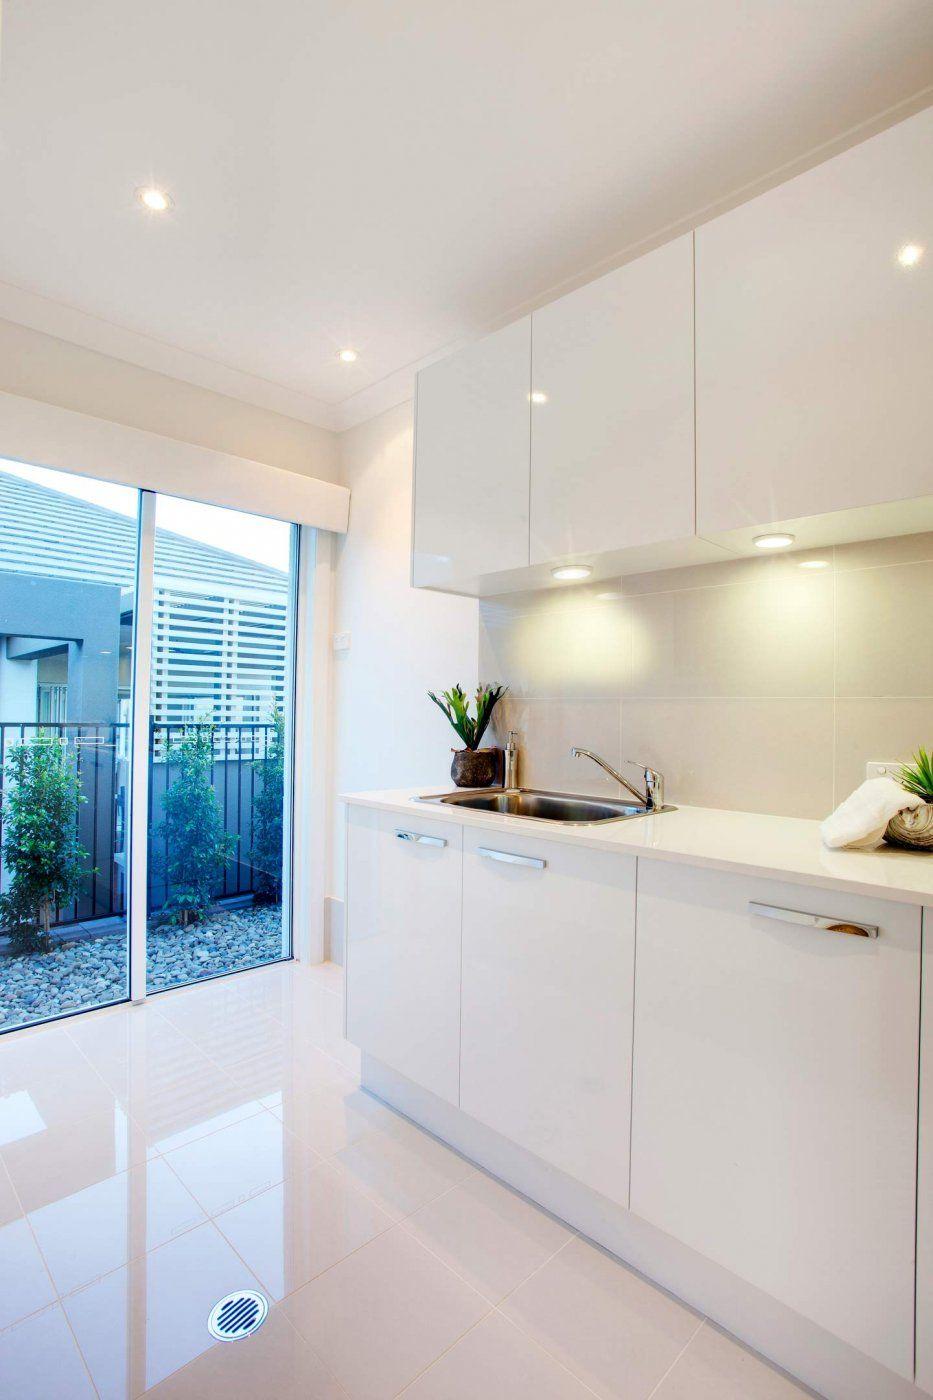 White Bathroom Laundry Storage avoca - images | mcdonald jones homes | new house- bathroom ideas